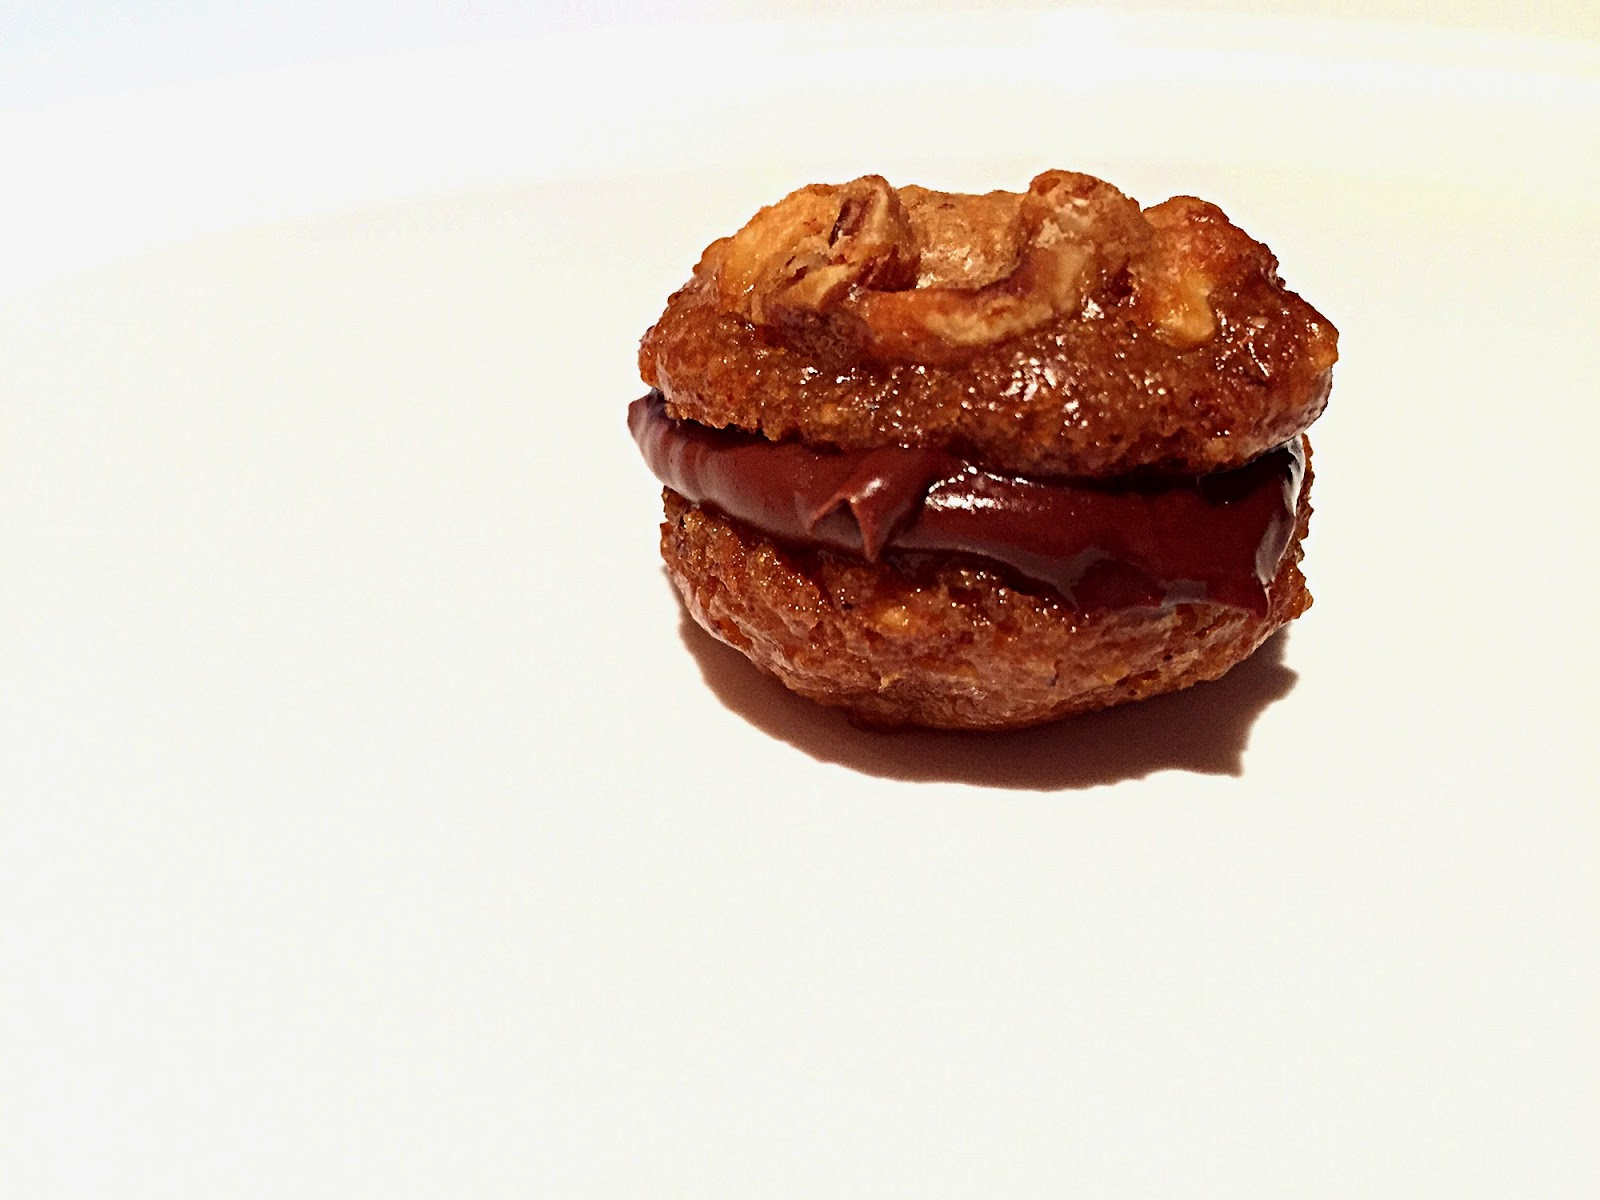 tartufi dolci del piemonte